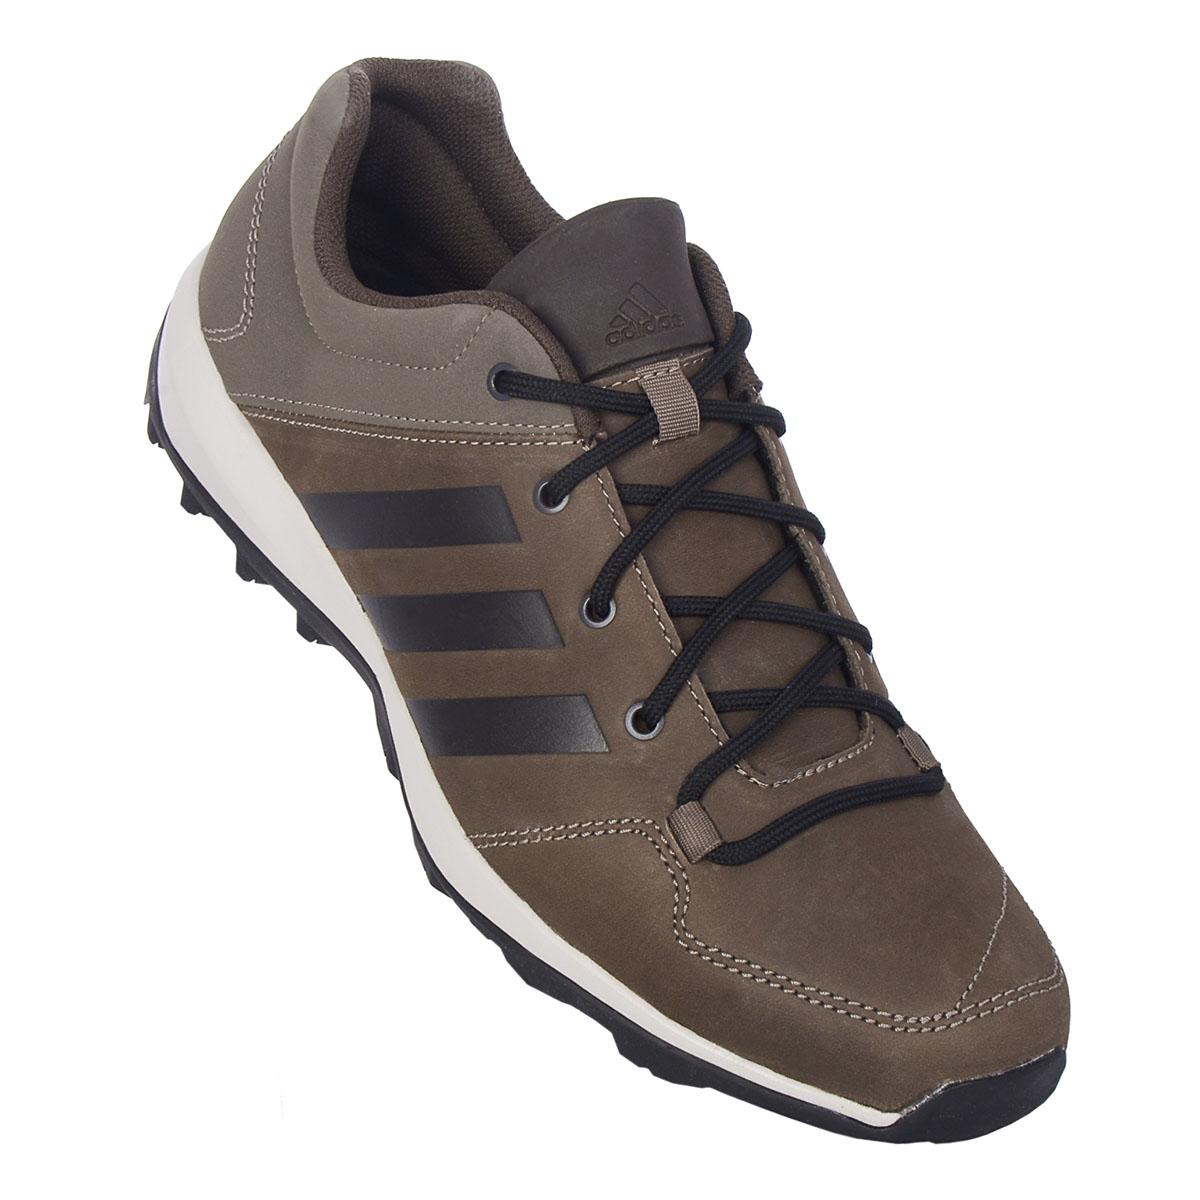 quality design b00fb 0dd5f NEU adidas Daroga Plus Lea Herren Schuhe Braun AQ3978 SALE